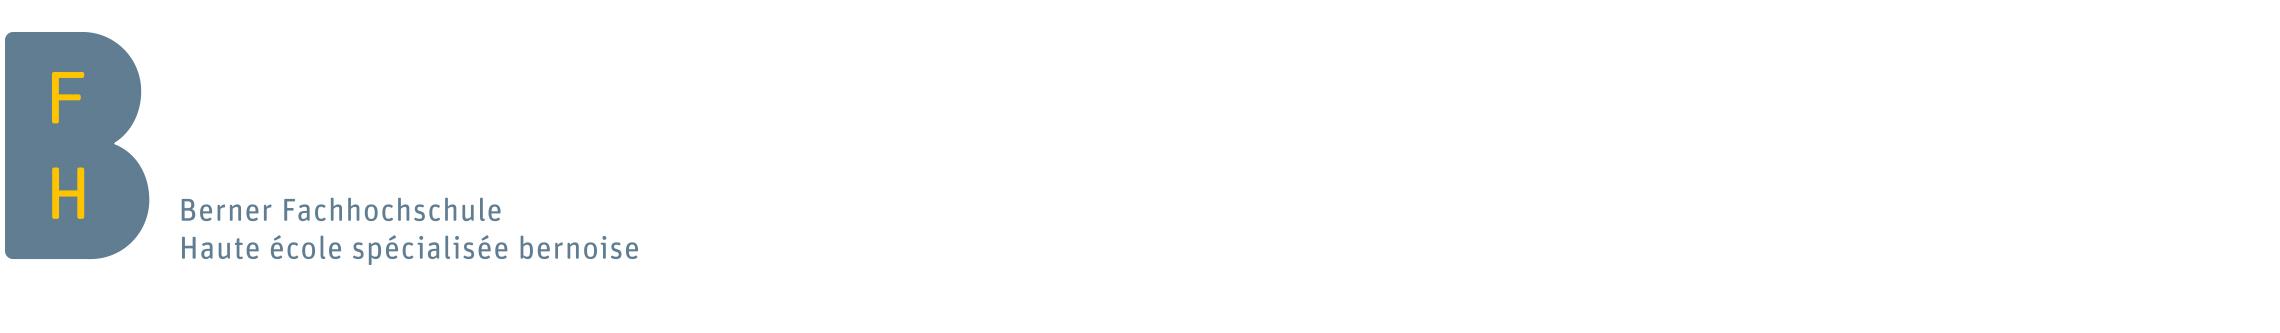 Berner Fachhochschule Logo